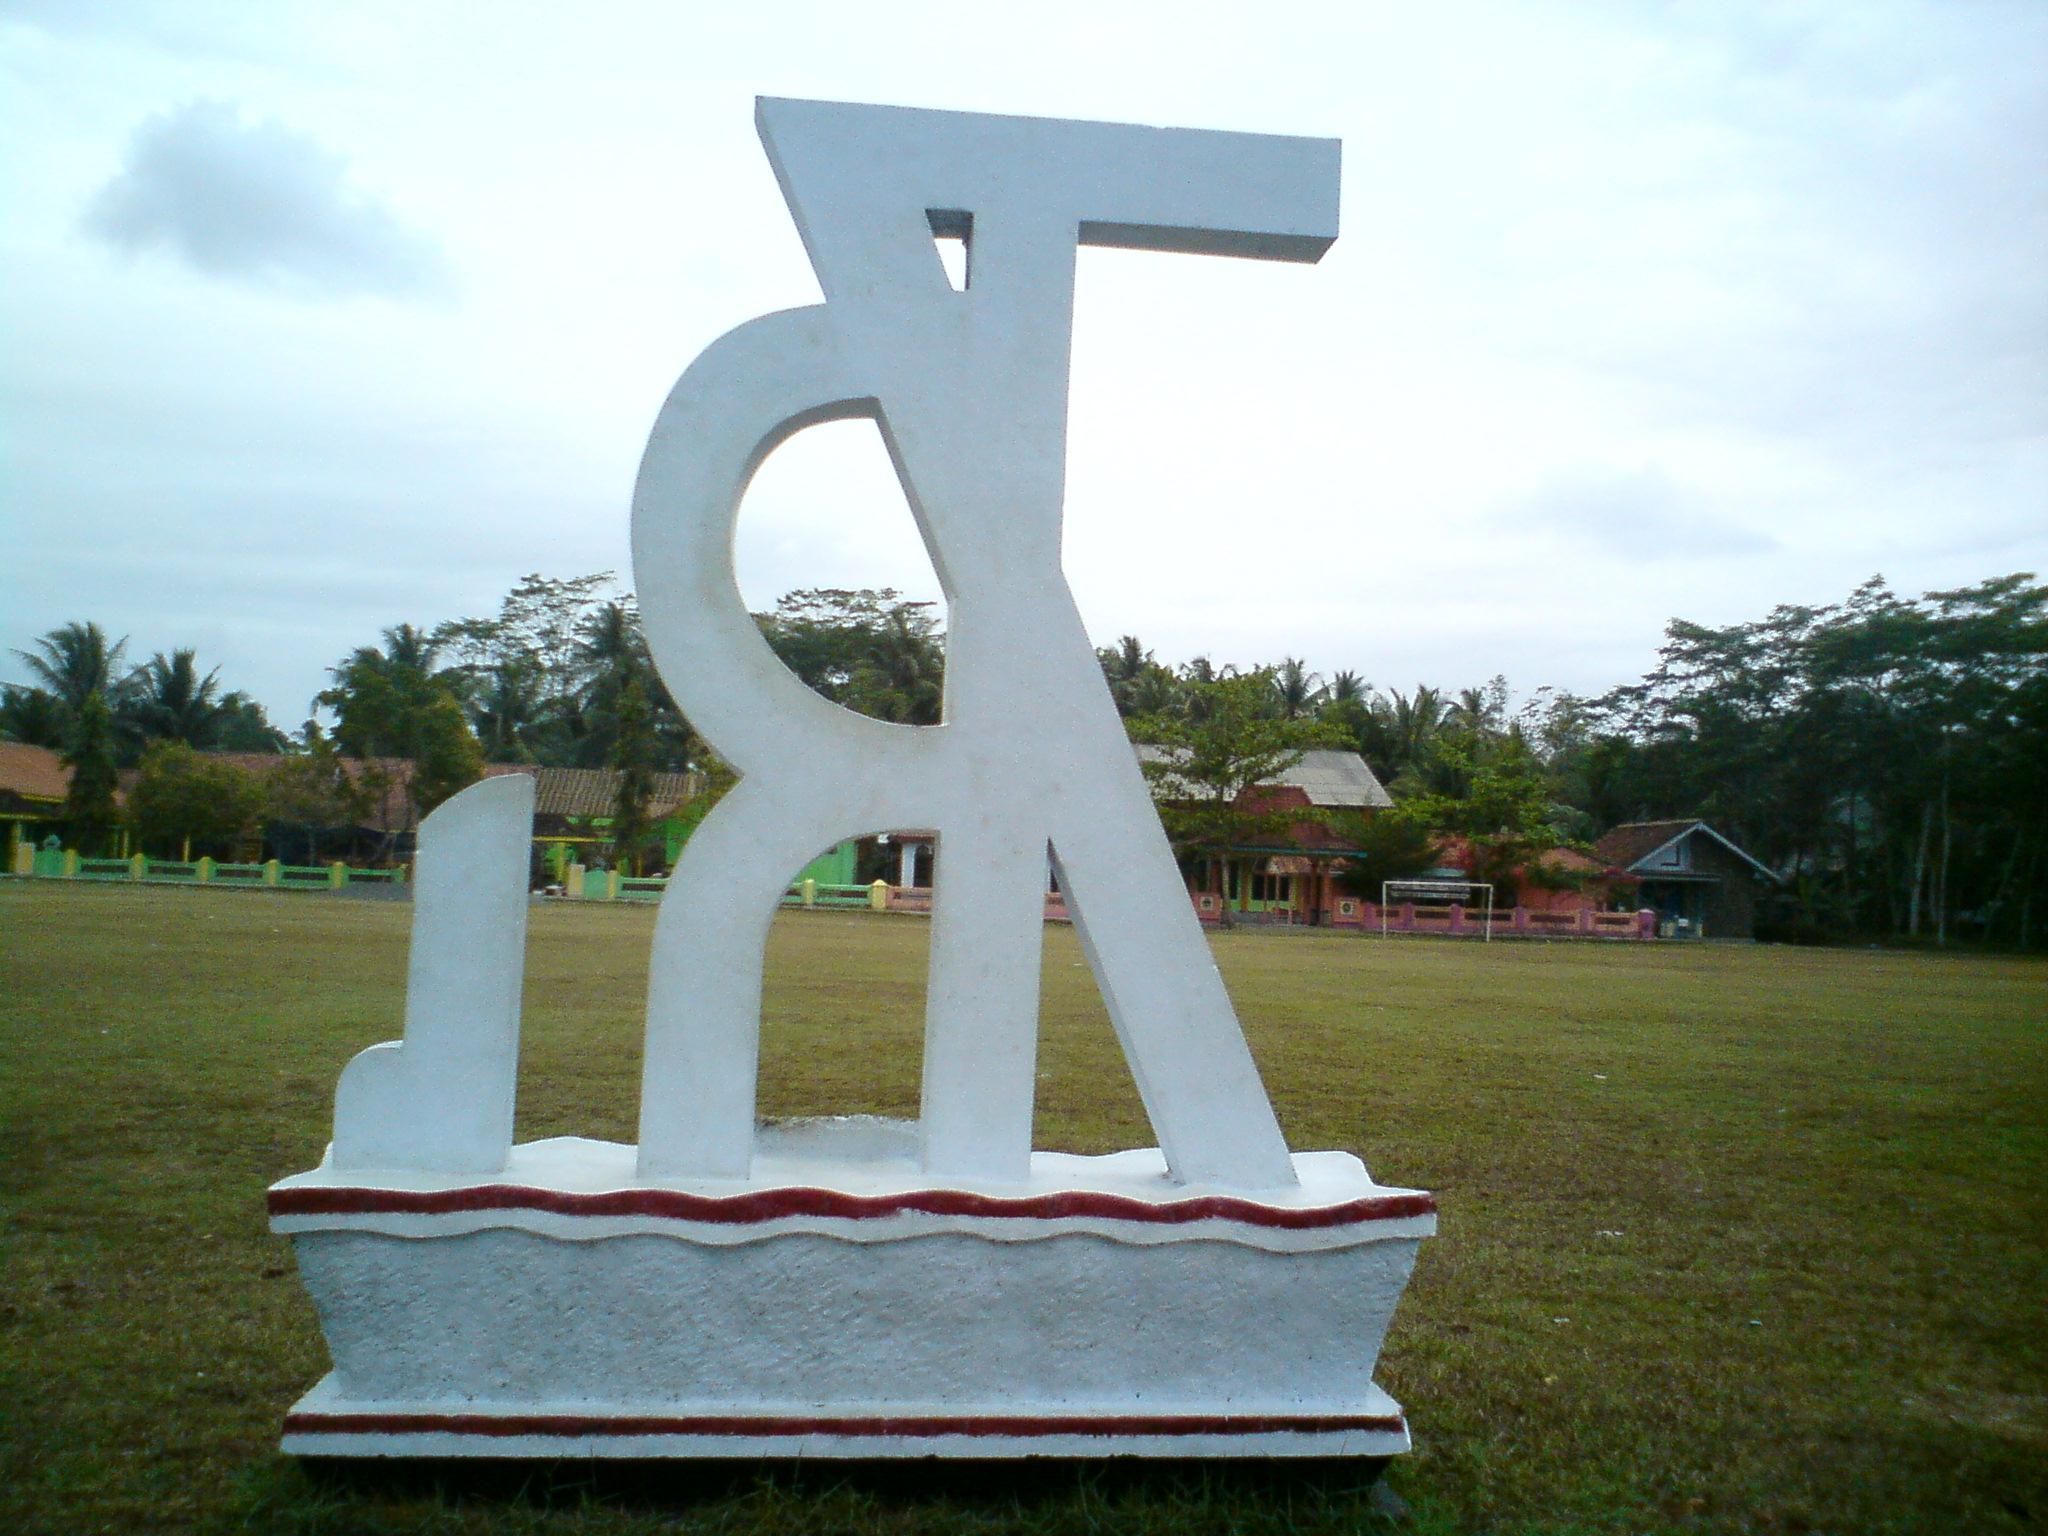 Misteri Tugu Kecamatan Pituruh Purworejo On24act Selamat Sore Tasker Sedoyo